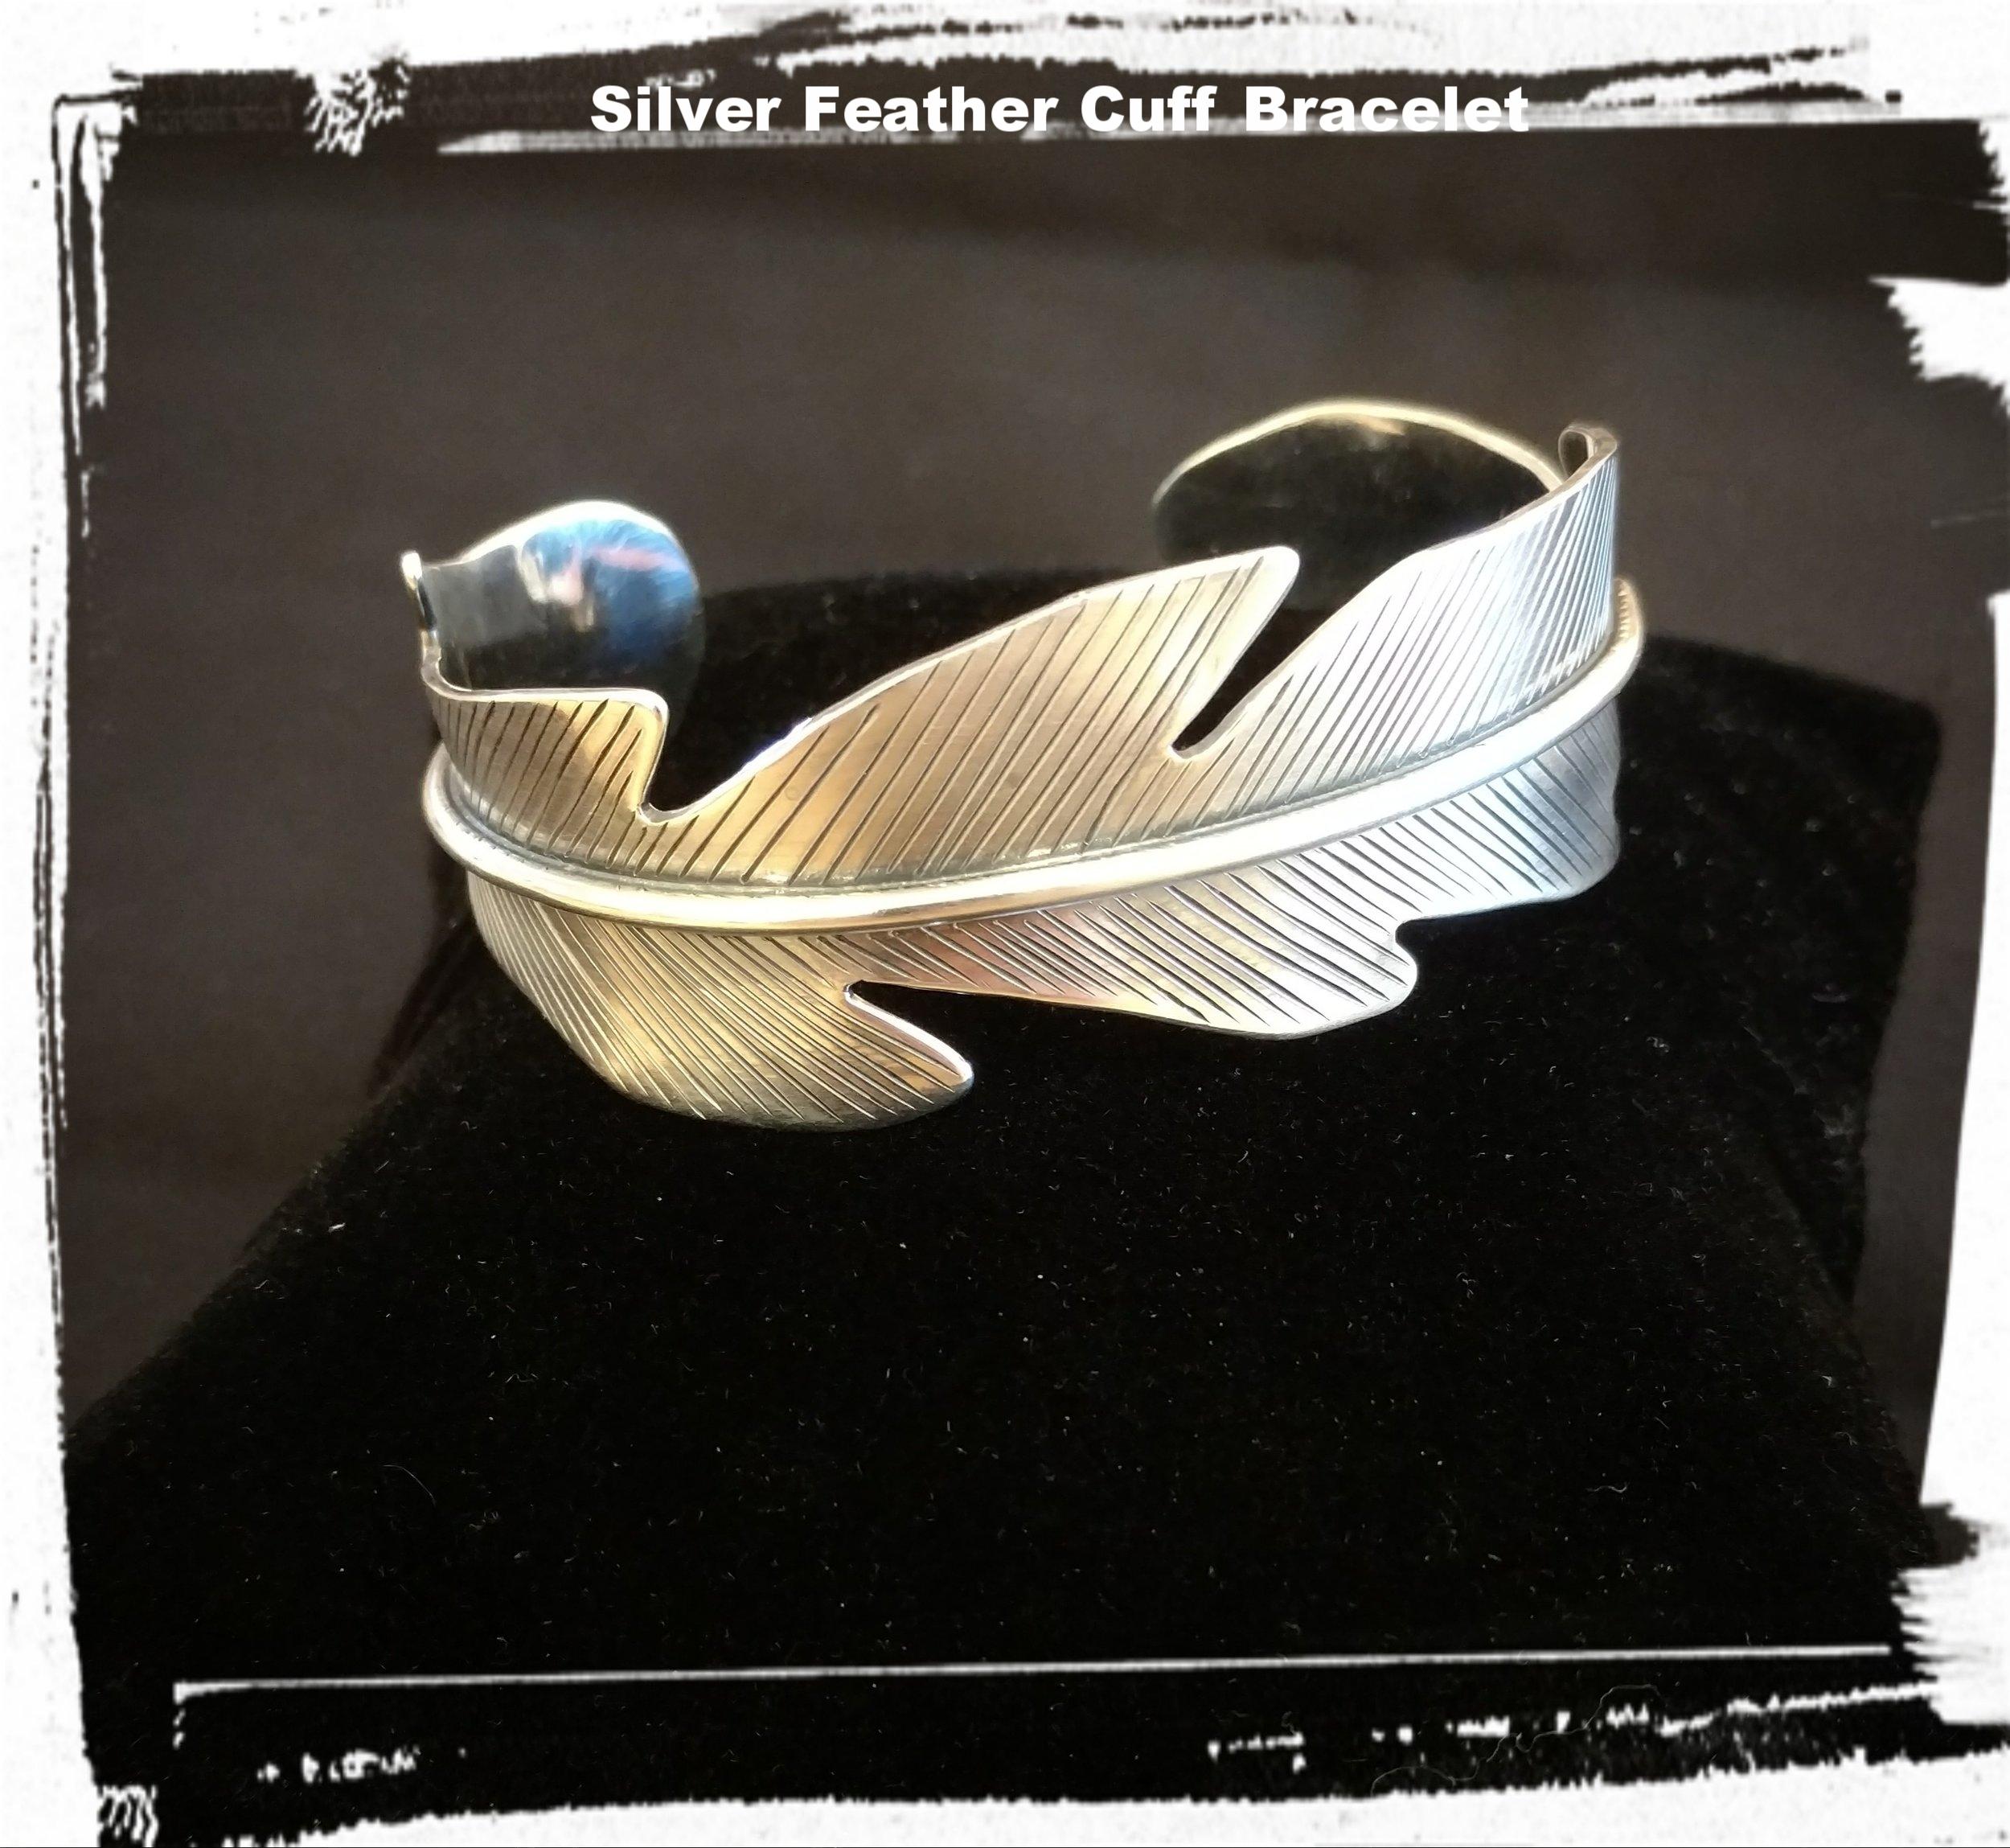 Silver Feather Cuff Bracelet